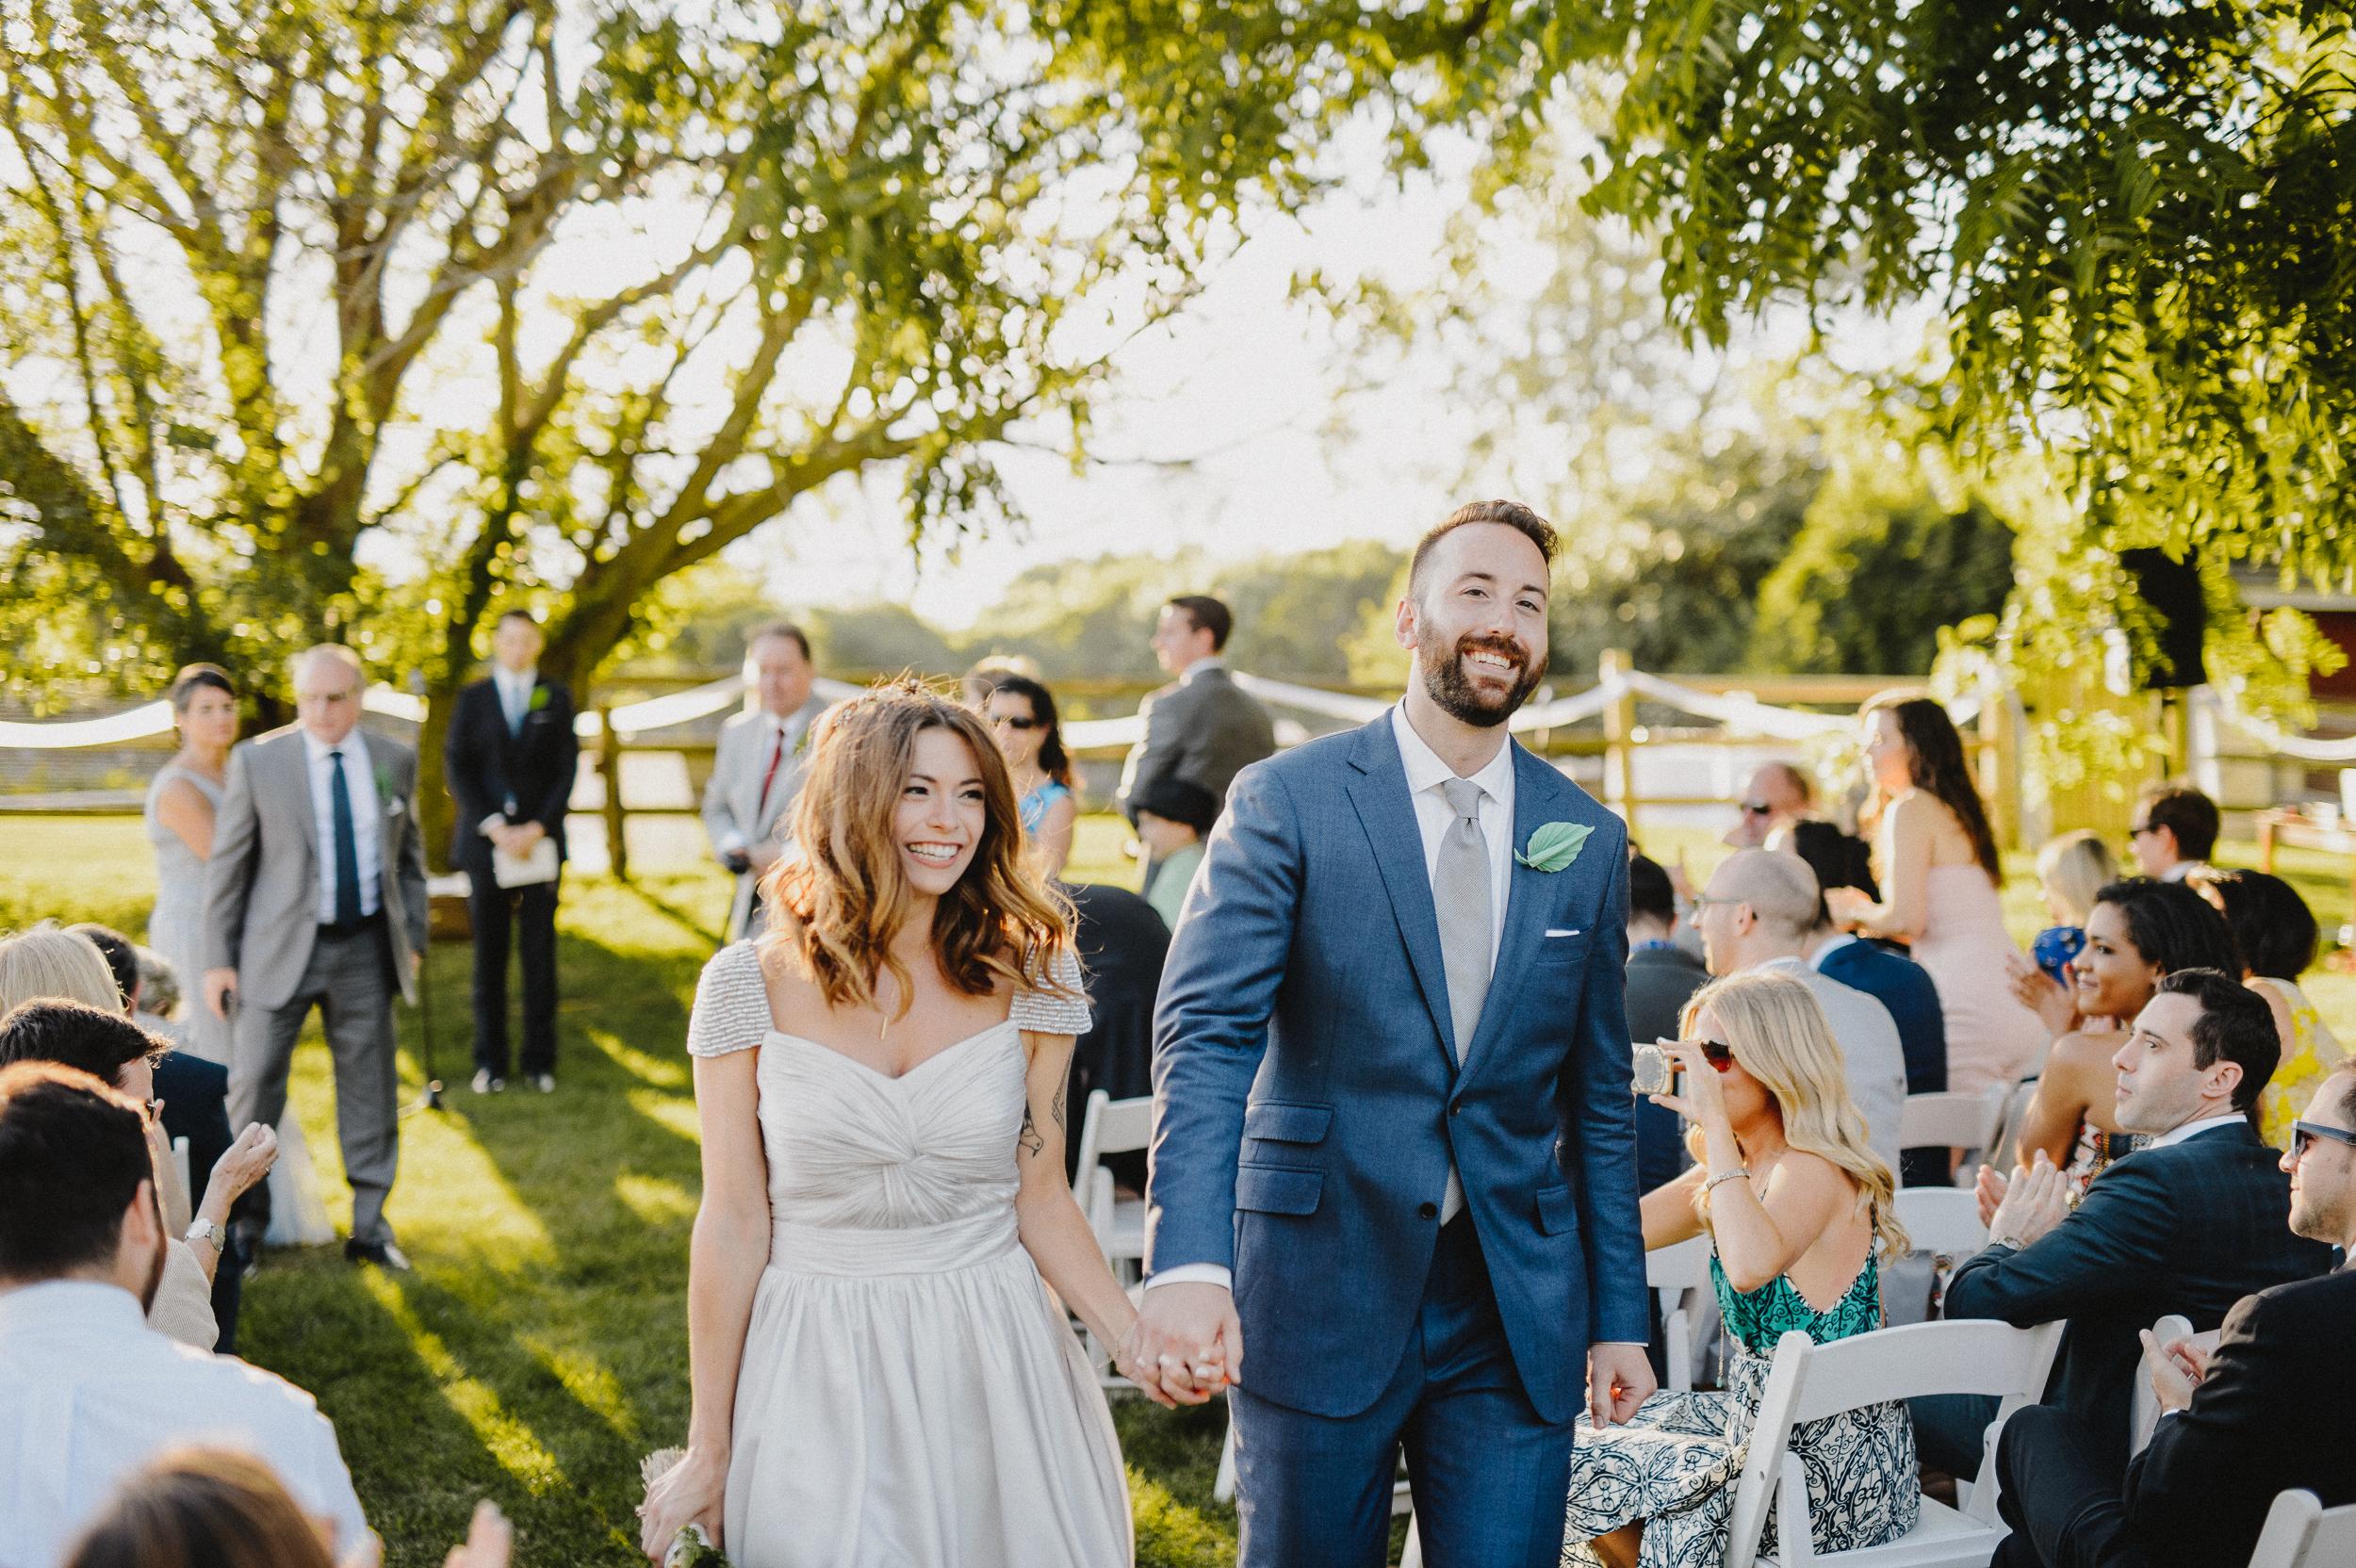 Pioneer-farms-warwick-new-york-wedding-photographer066.jpg